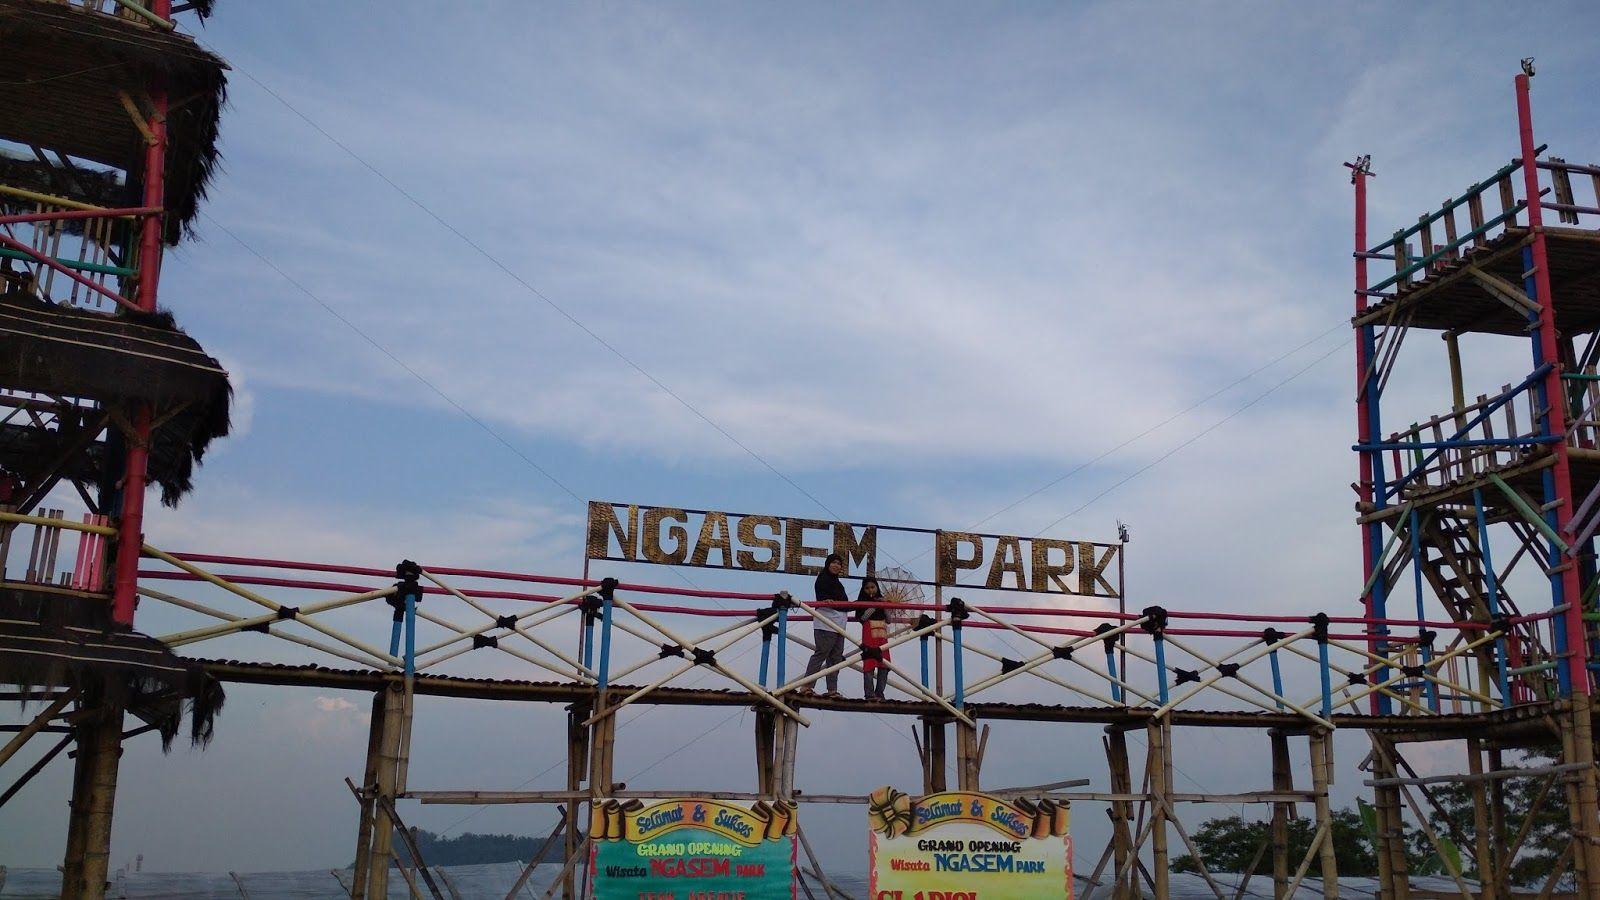 Ngasem Park Semarang